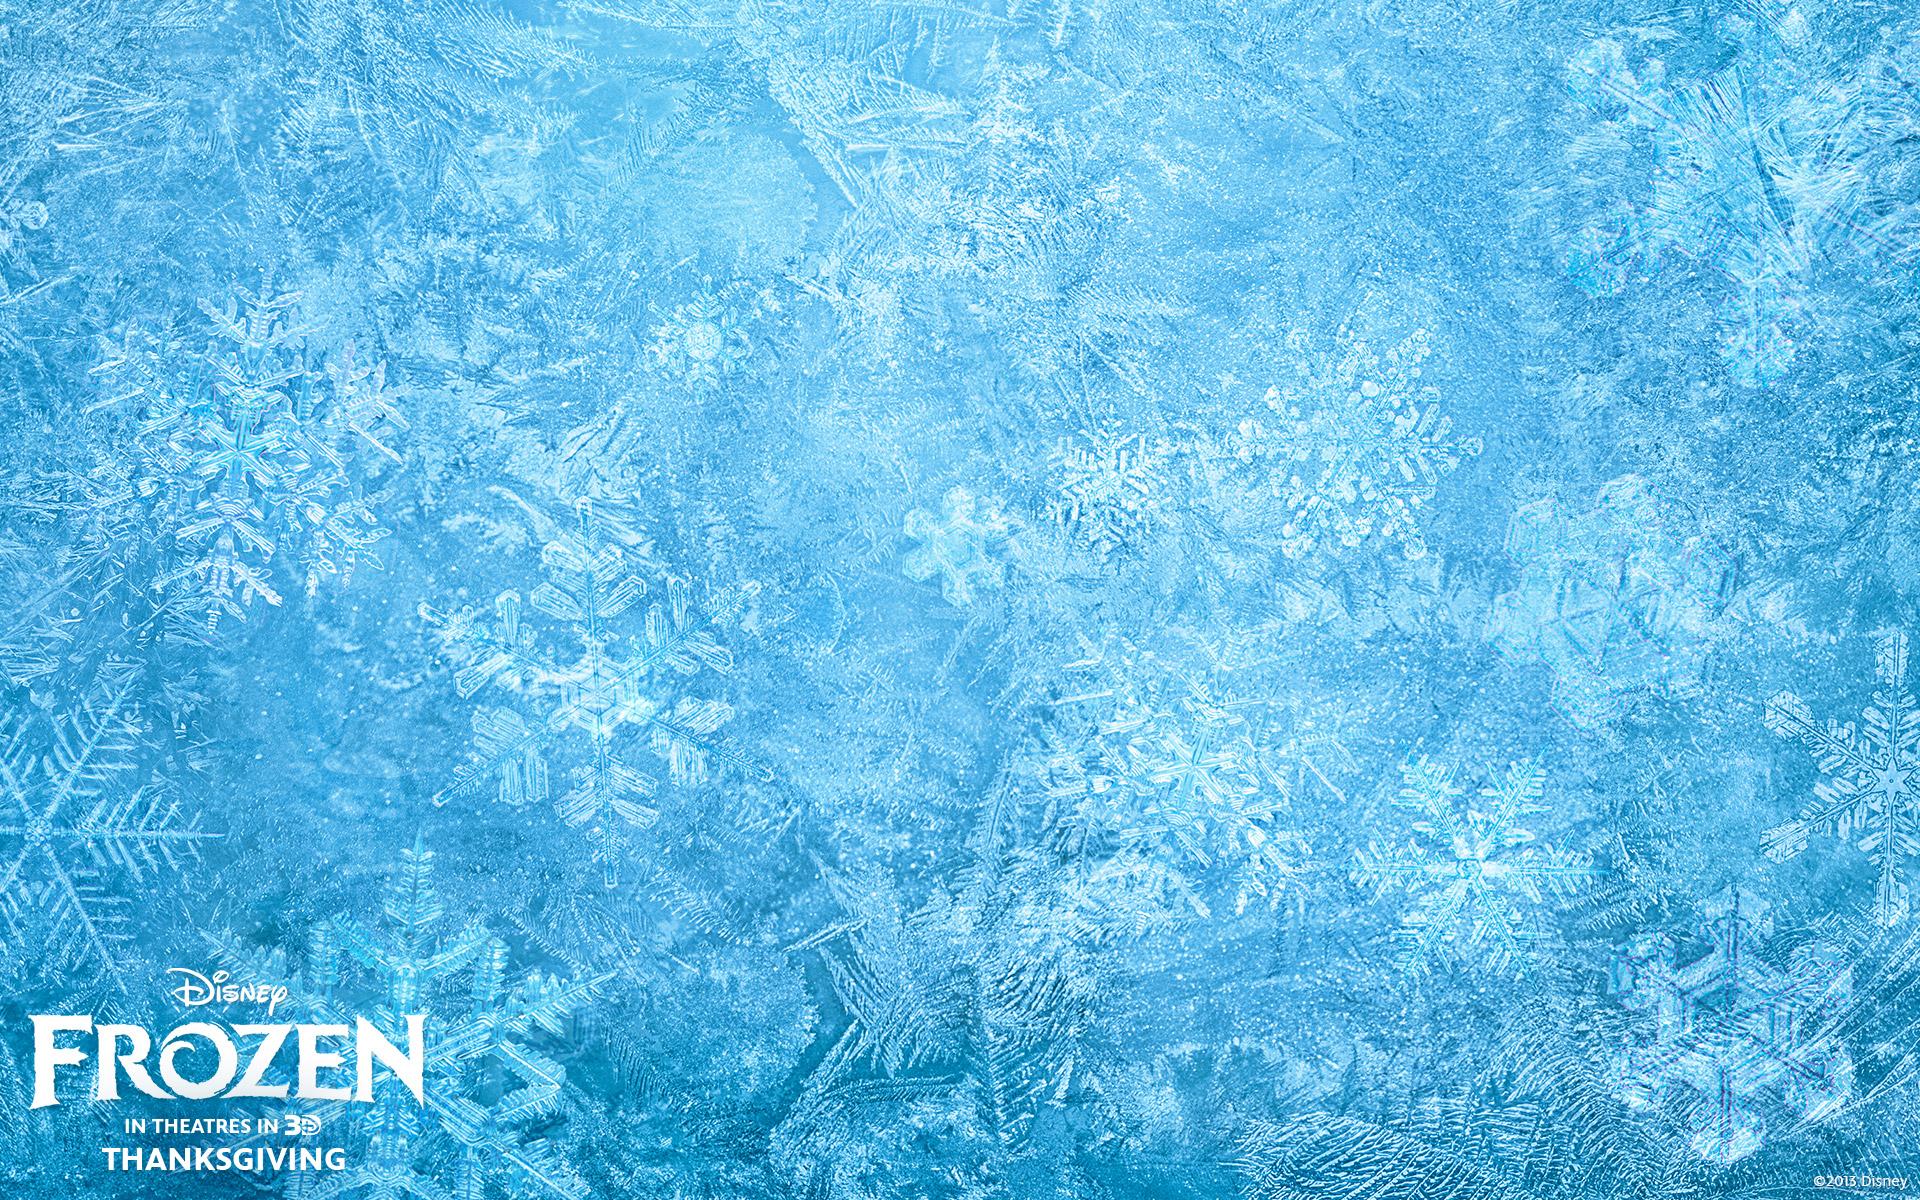 Frozen Wallpapers   Frozen Wallpaper 35894751 1920x1200